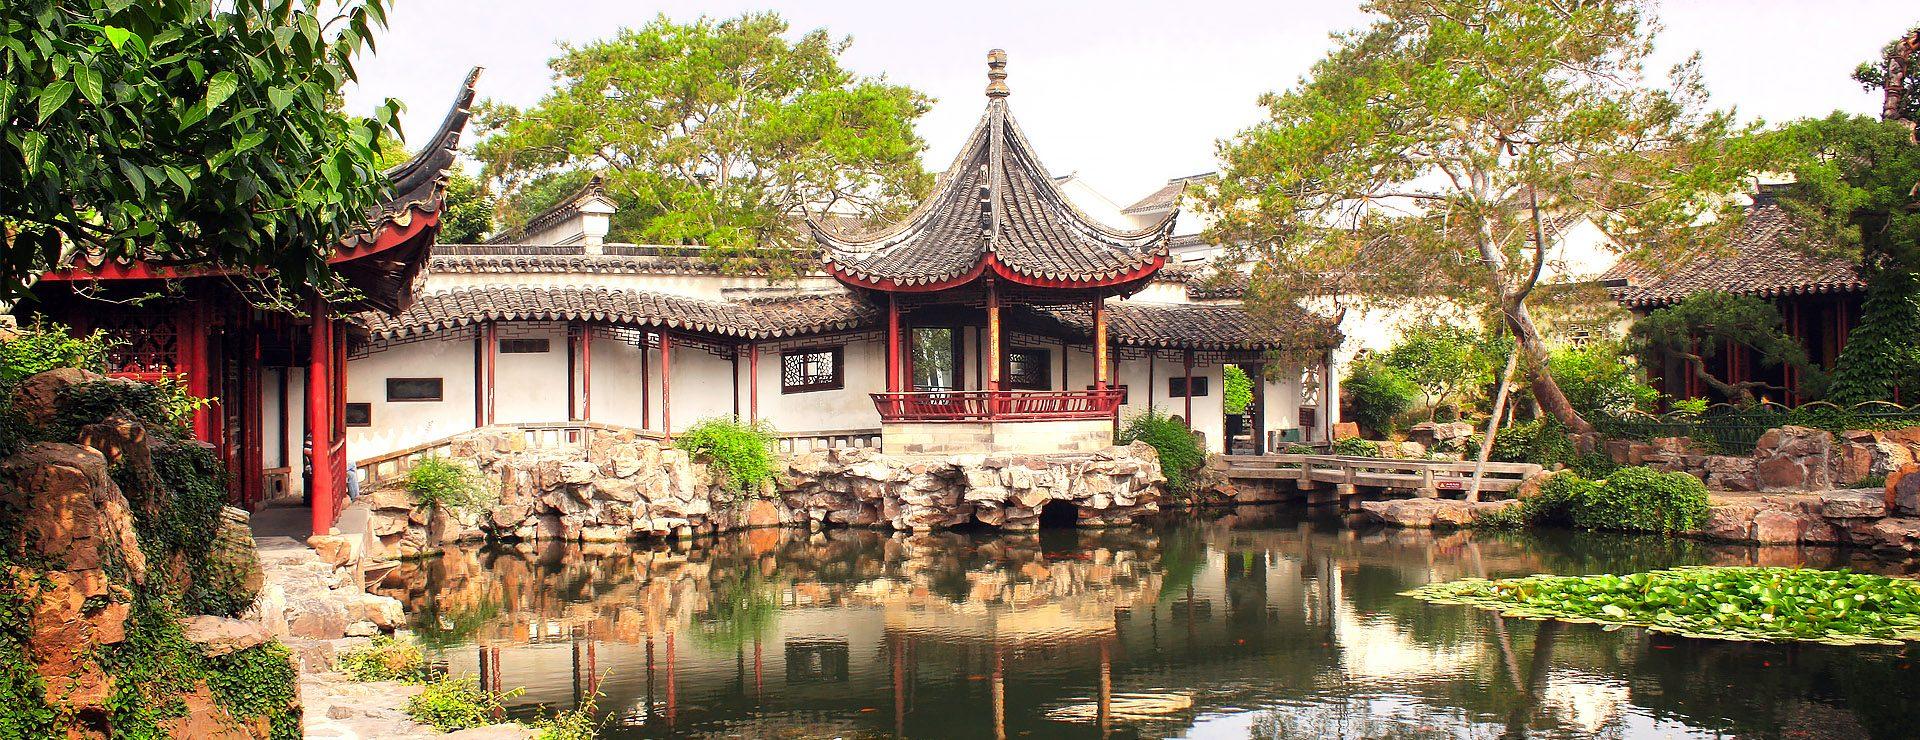 Suzhous trädgårdar